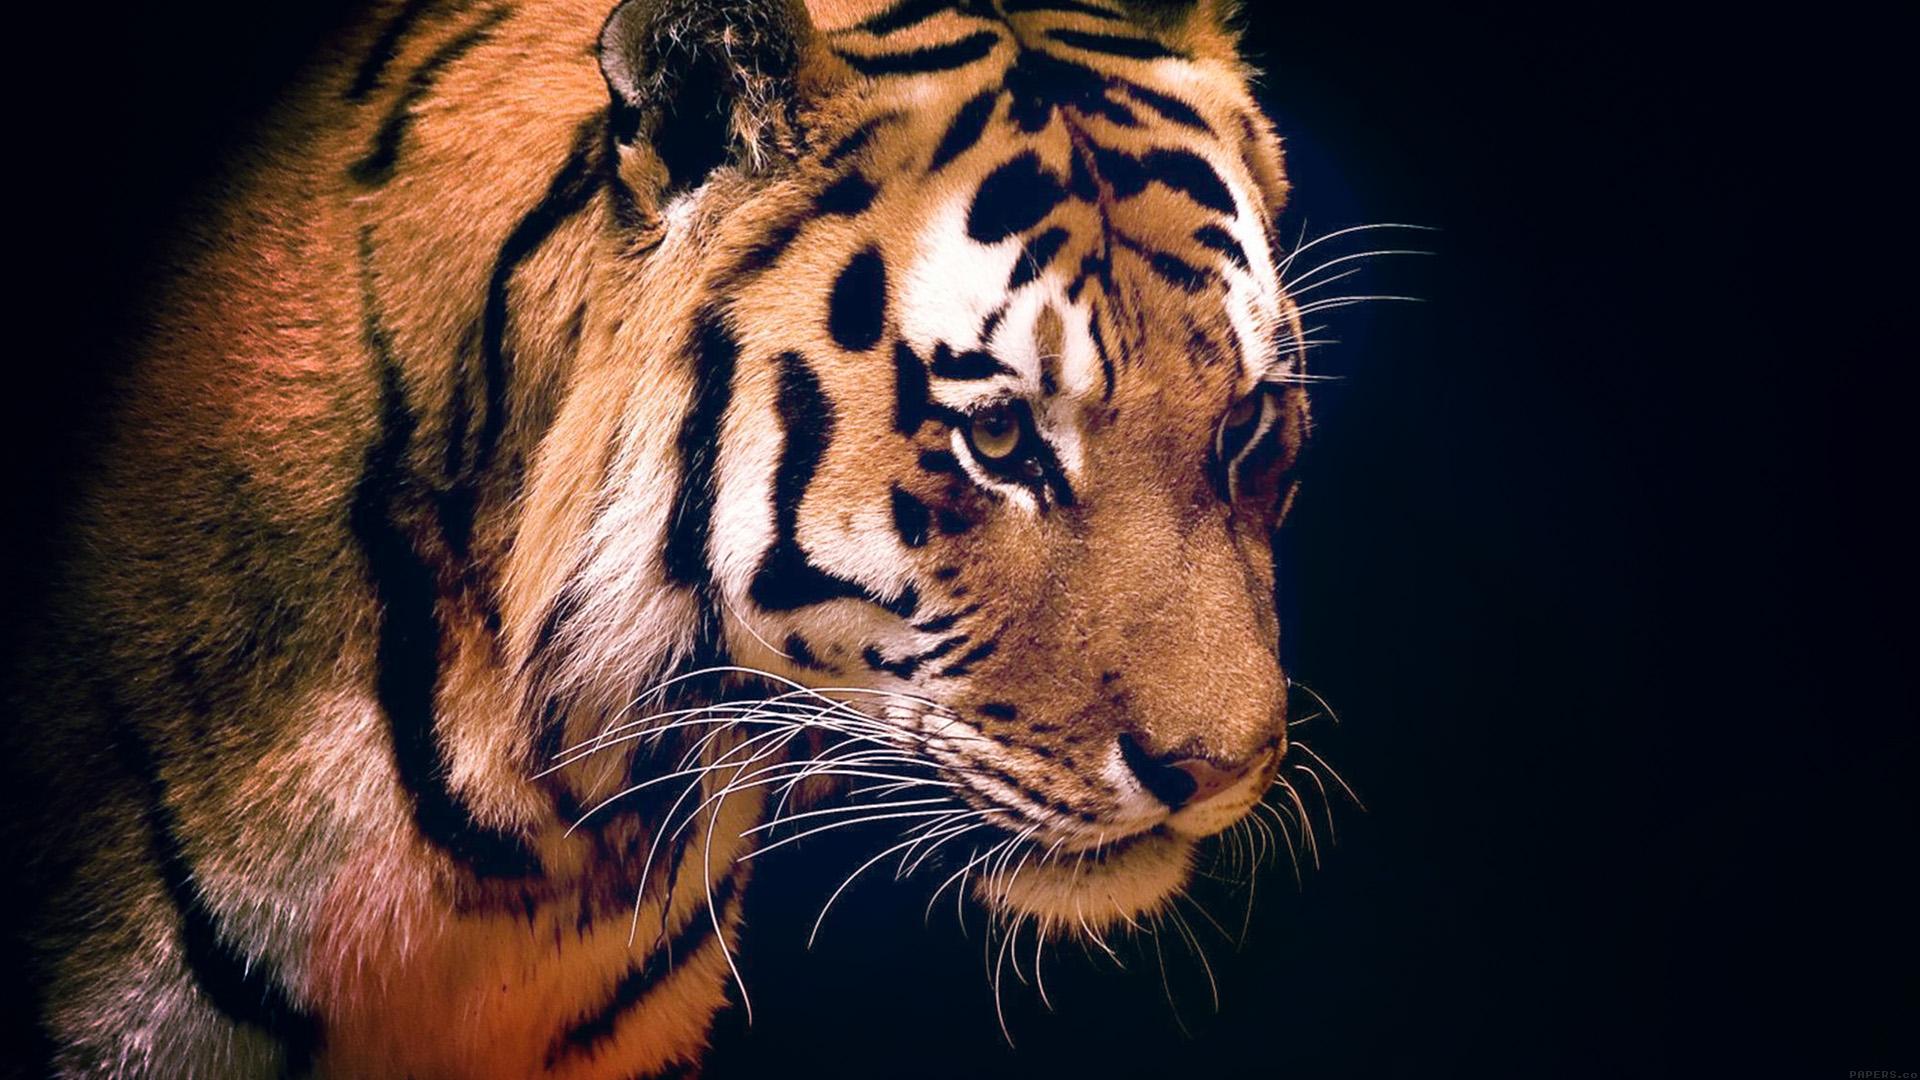 Fall Desktop Wallpaper For Mac Mm82 Tiger Dark Animal Love Nature Wallpaper